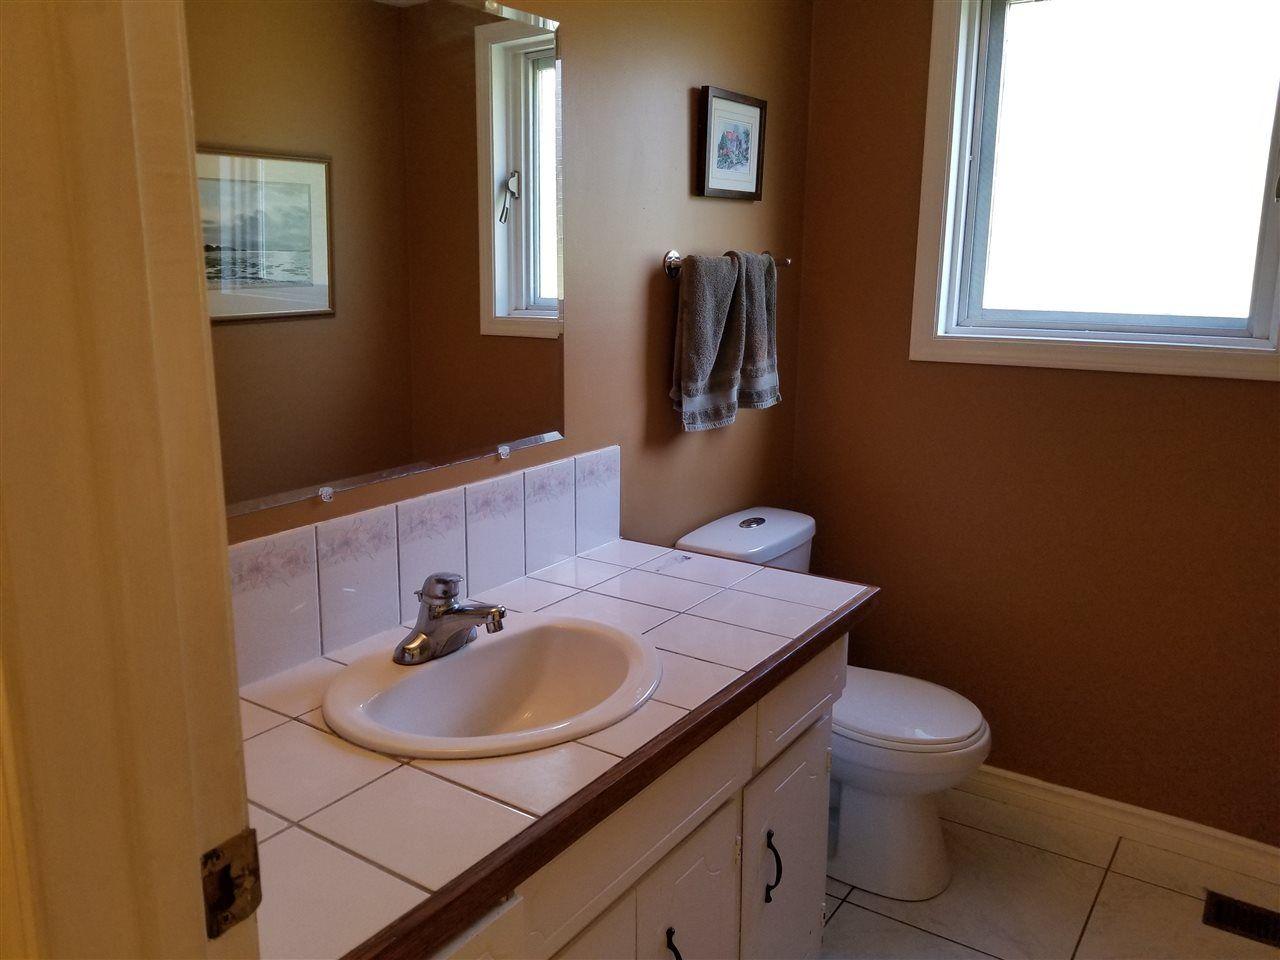 Photo 13: Photos: 511 TAMARACK Road in Williams Lake: Esler/Dog Creek House for sale (Williams Lake (Zone 27))  : MLS®# R2487403